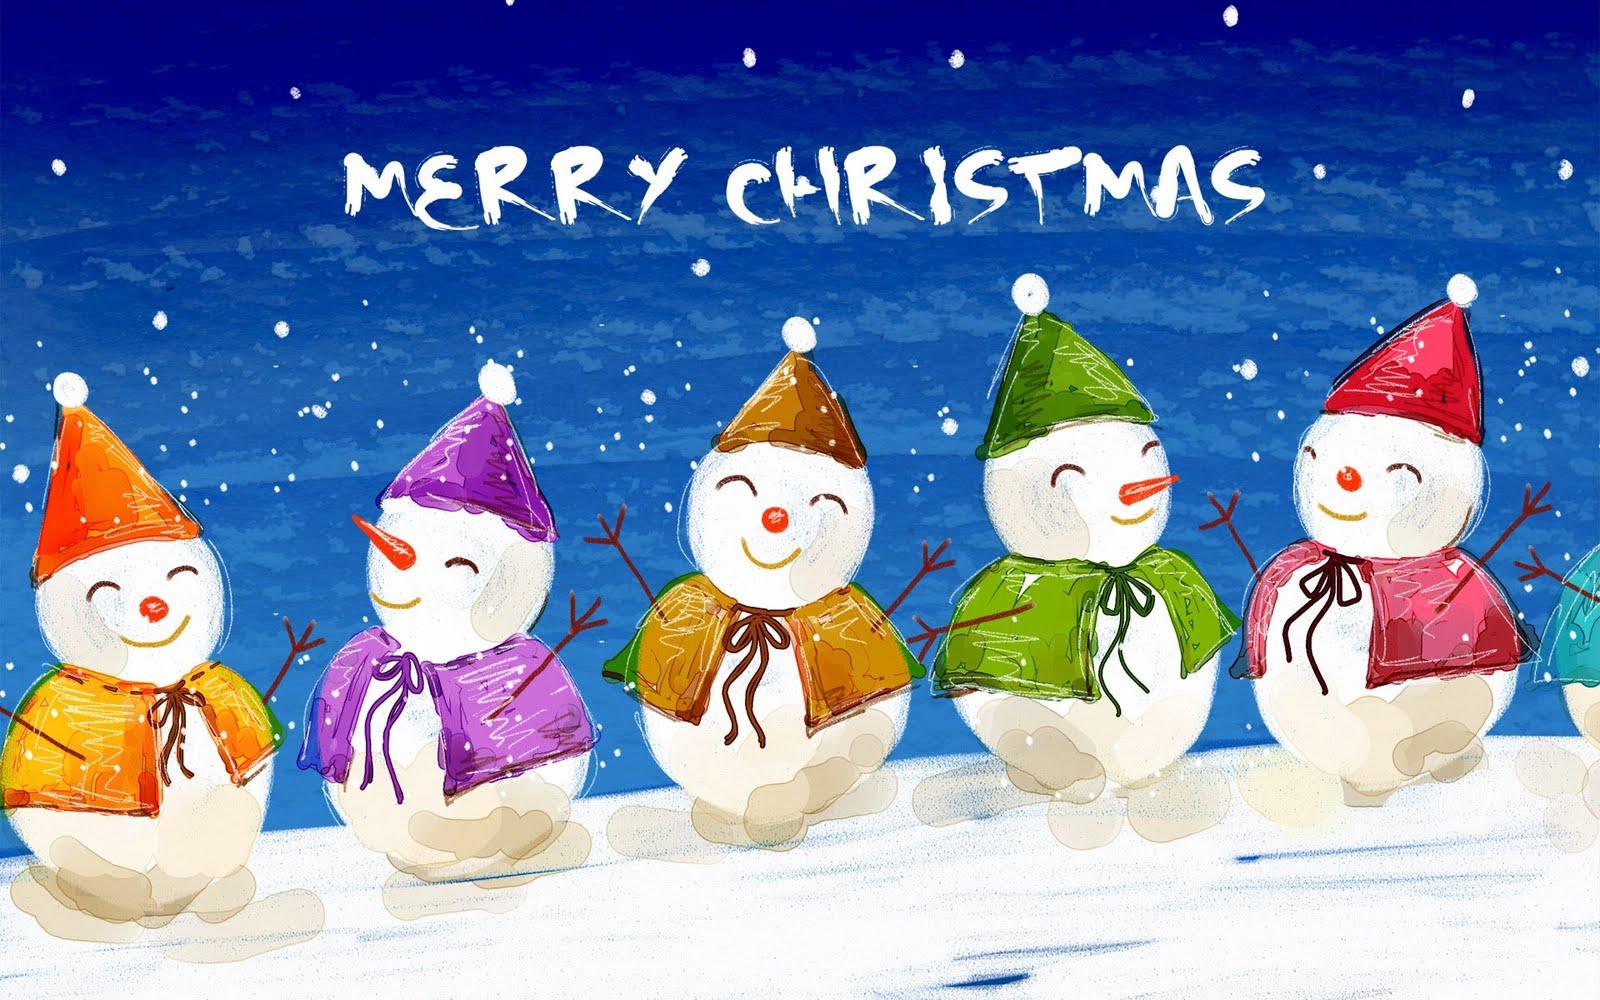 http://4.bp.blogspot.com/-4Dqsb-qIevQ/TvDn0ZHkGaI/AAAAAAAAtDw/p_SWI-VwMfg/s1600/merry-christmas-everyone-feliz-navidad-para-todos.jpg